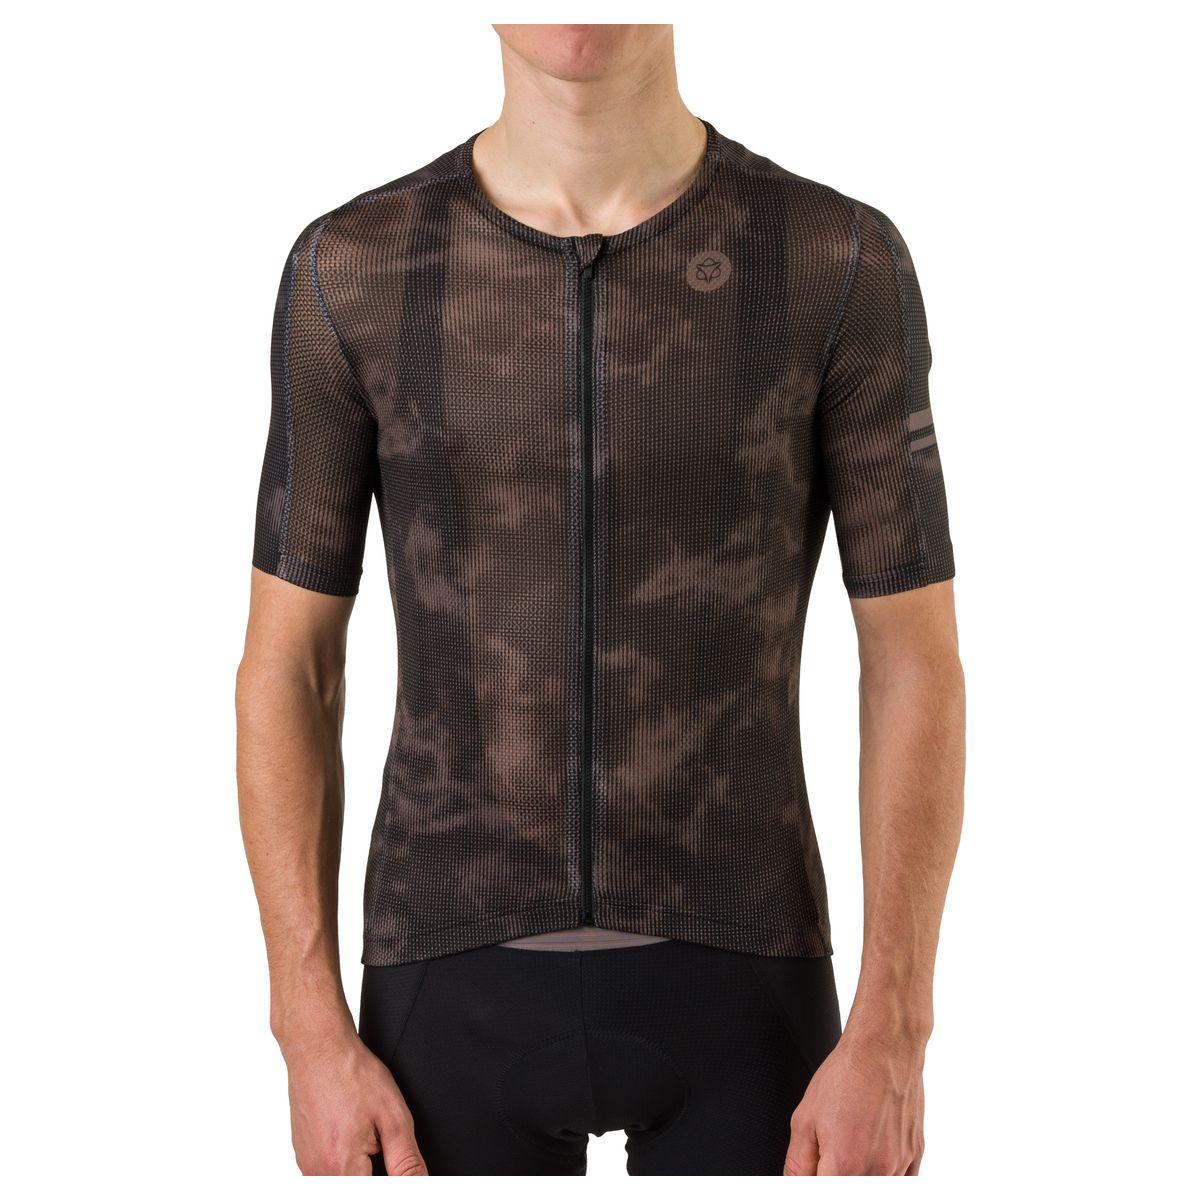 High Summer Fietsshirt III Trend Heren fit example